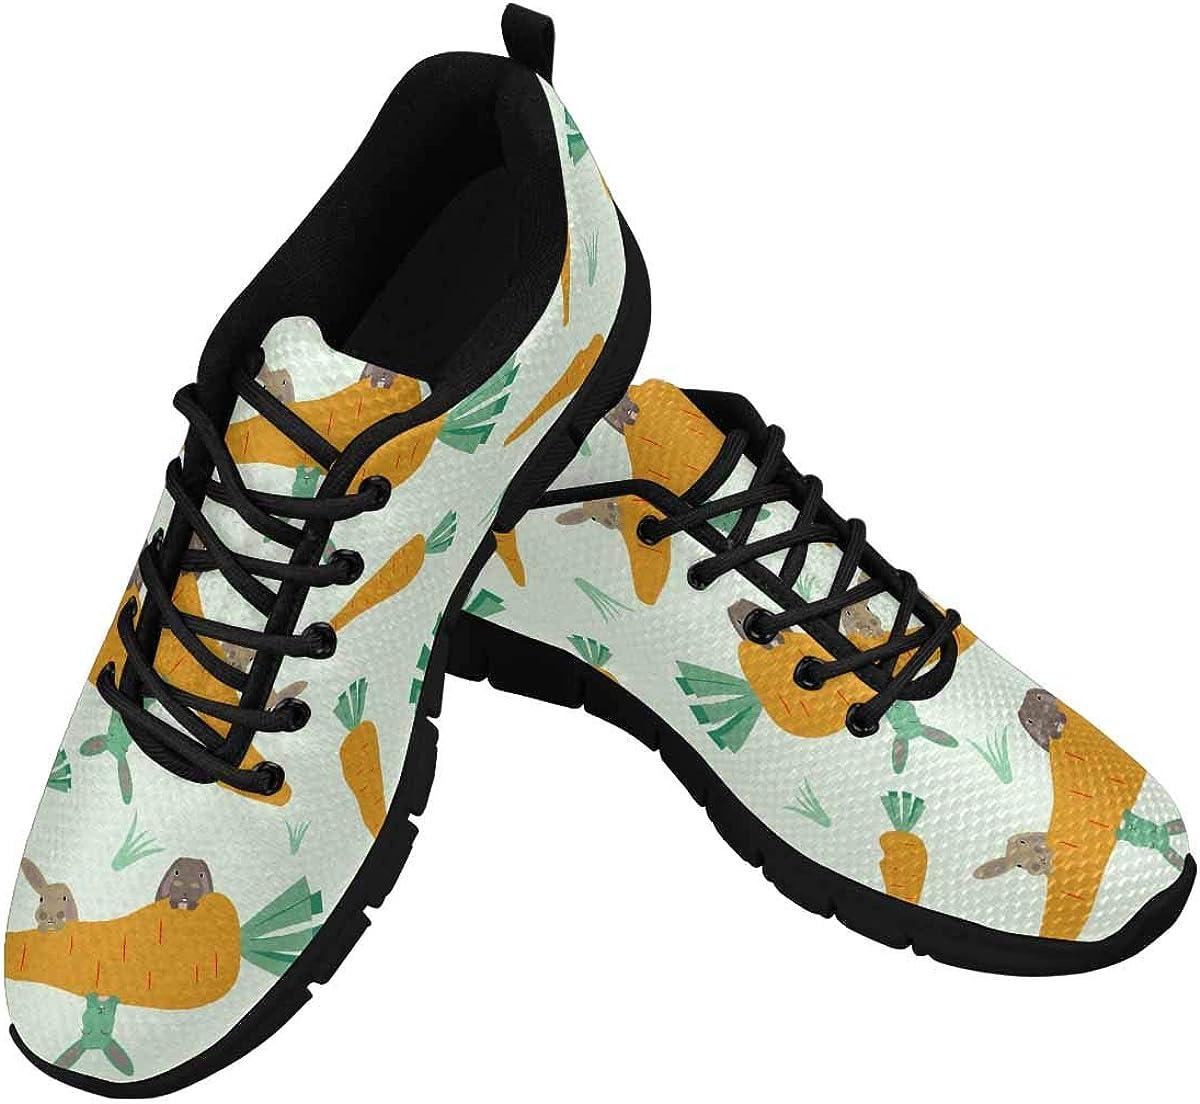 INTERESTPRINT Cute Rabbit Women's Athletic Walking Running Sneakers Comfortable Lightweight Shoes